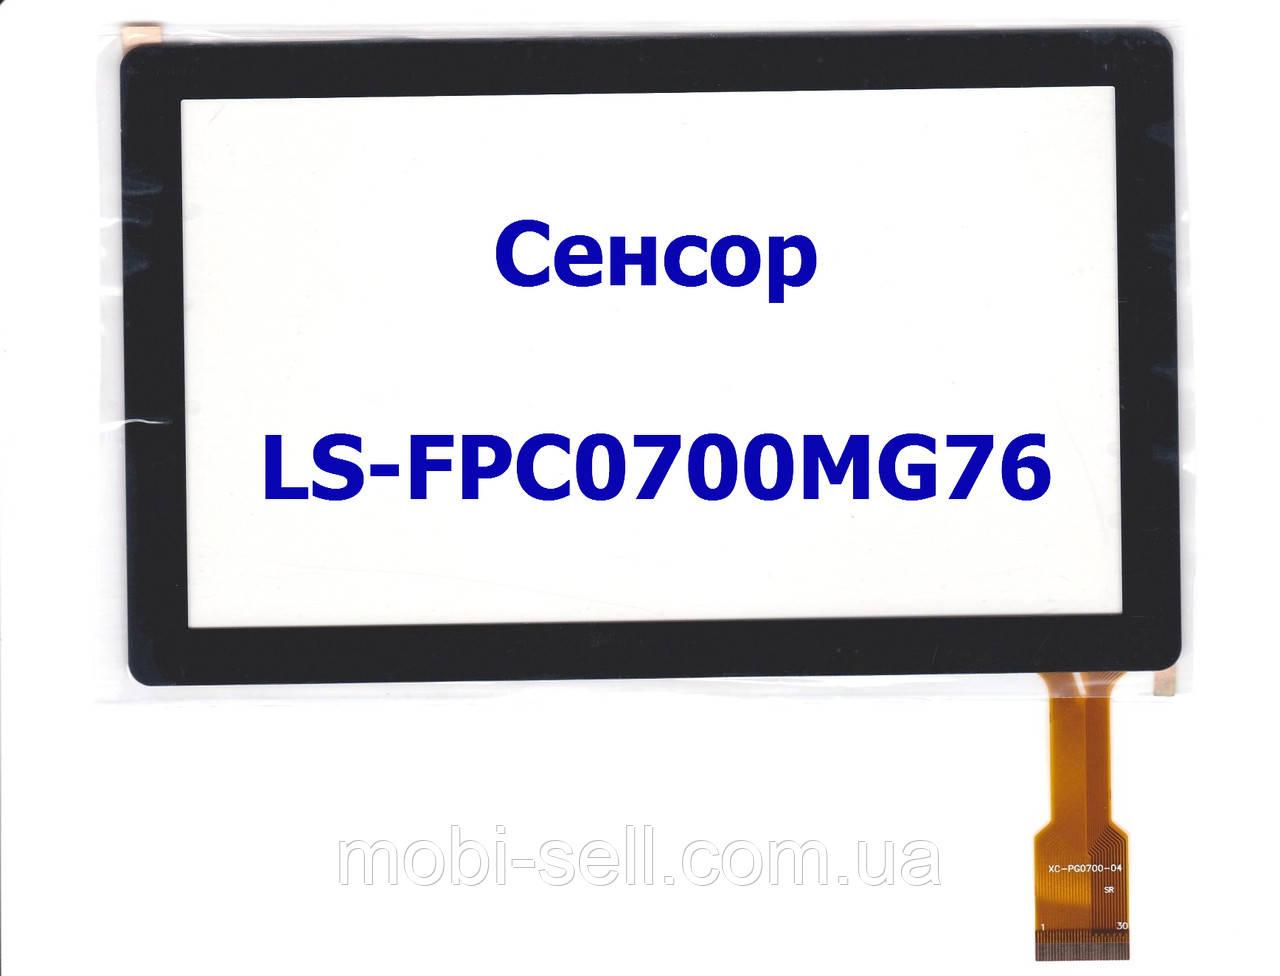 Сенсорный экран тачскрин сенсор 7'' LS-F1B215A JYX / GT70Q88001-FPC (V0.0) / LS-FPC0700MG76